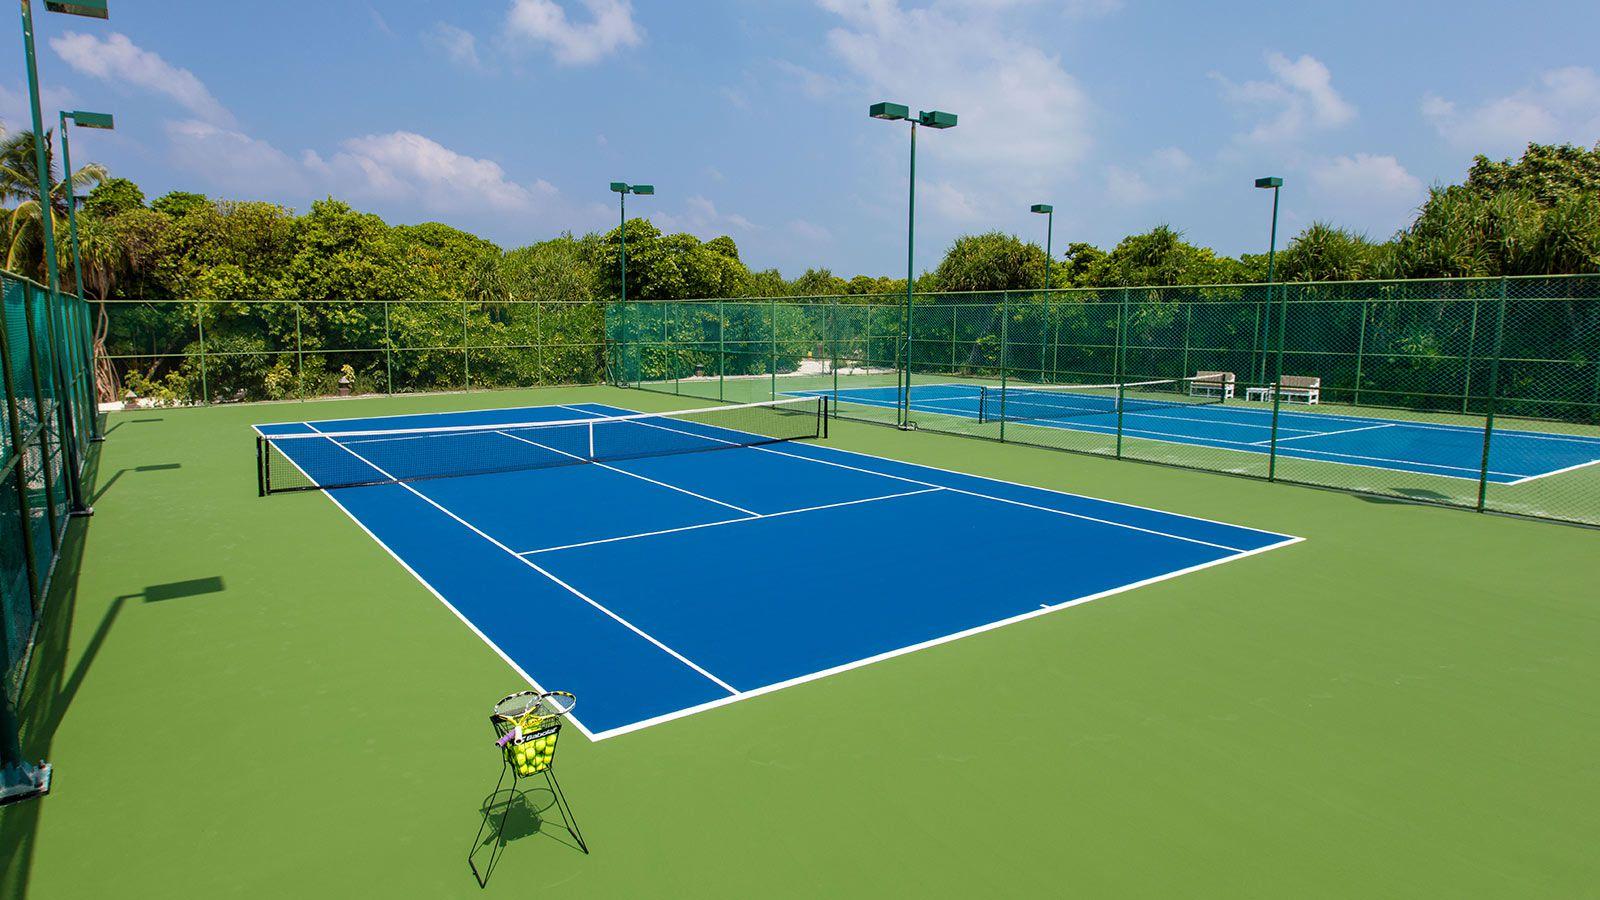 Maldives Beach Resort - Activities - Hideaway Maldives Resort Tennis